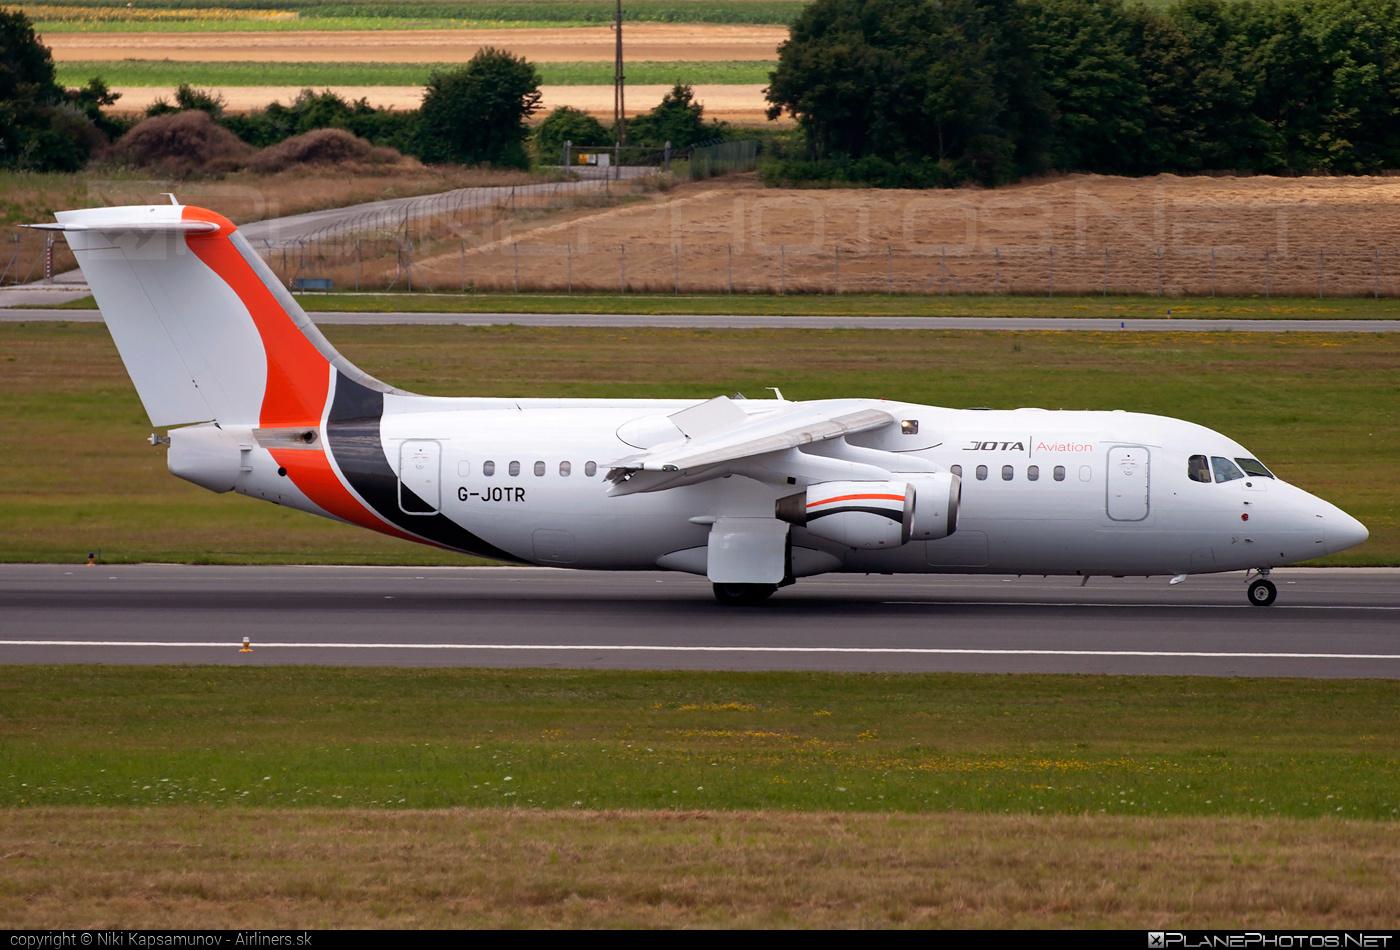 British Aerospace Avro RJ85 - G-JOTR operated by Jota Aviation #avro146rj85 #avrorj85 #bae146 #britishaerospace #jumbolino